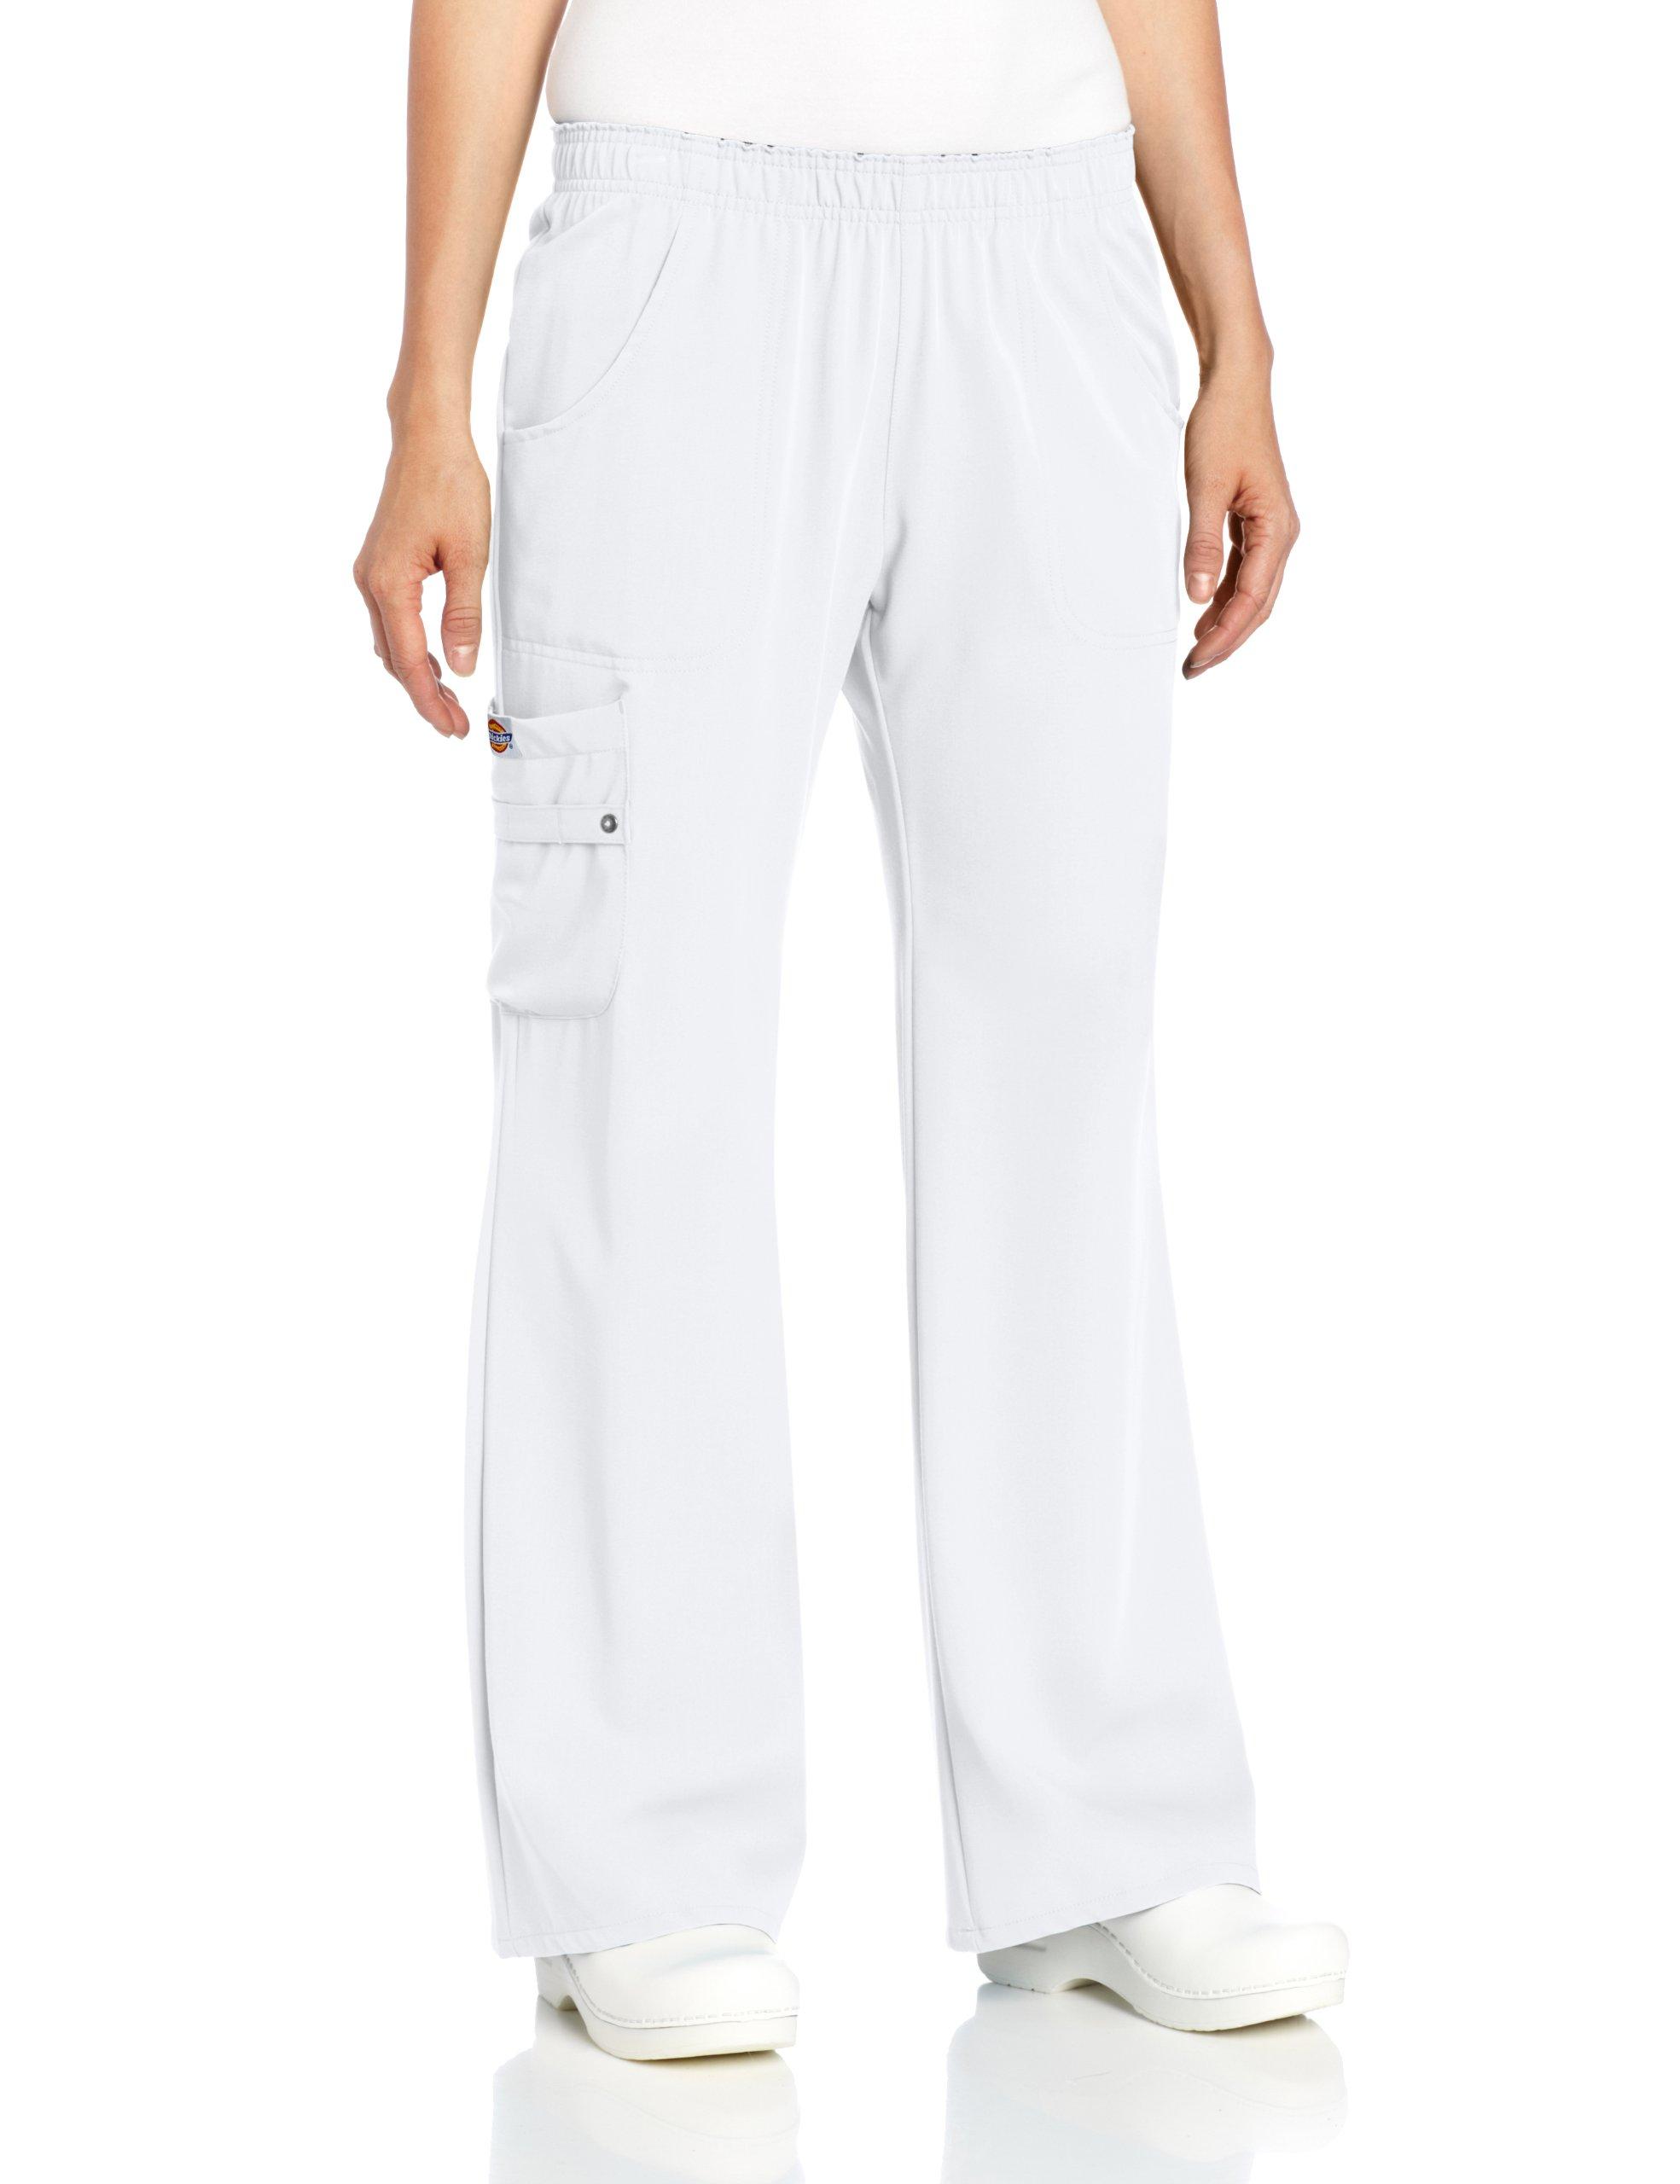 Dickies Scrubs Women's Xtreme Stretch Fit Elastic Waist, White, X-Large